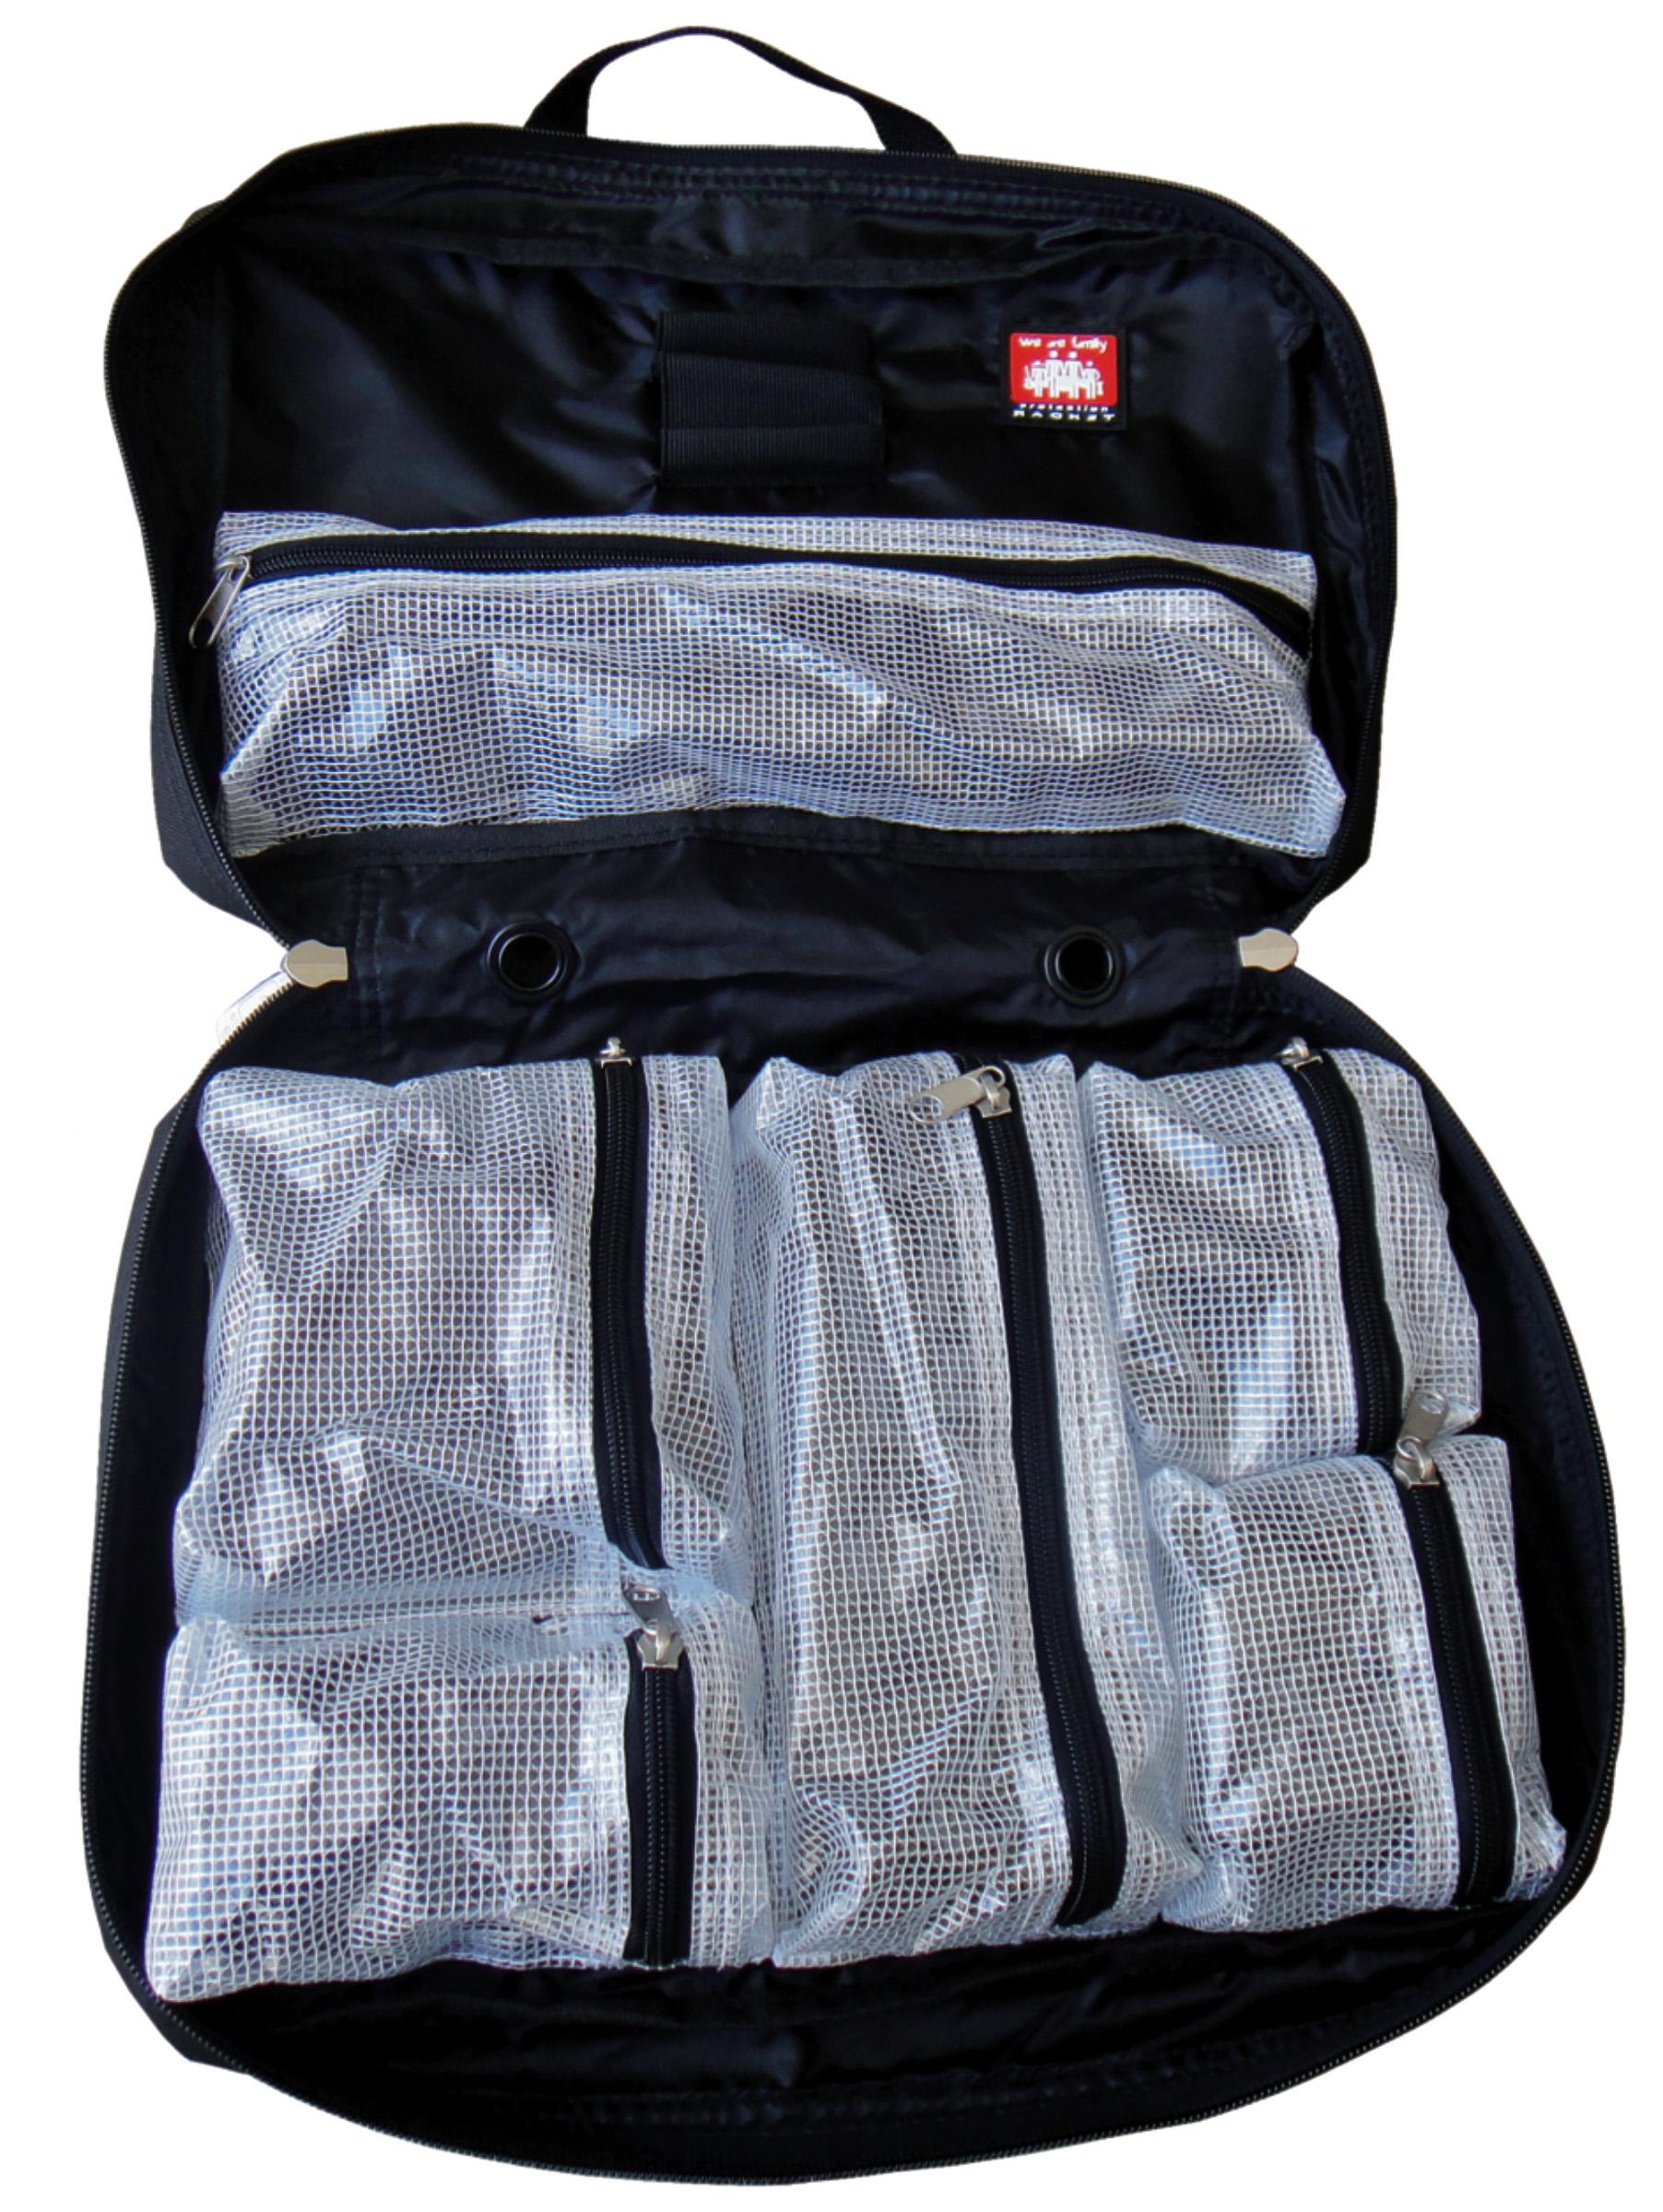 Musicians Tool Kit bag